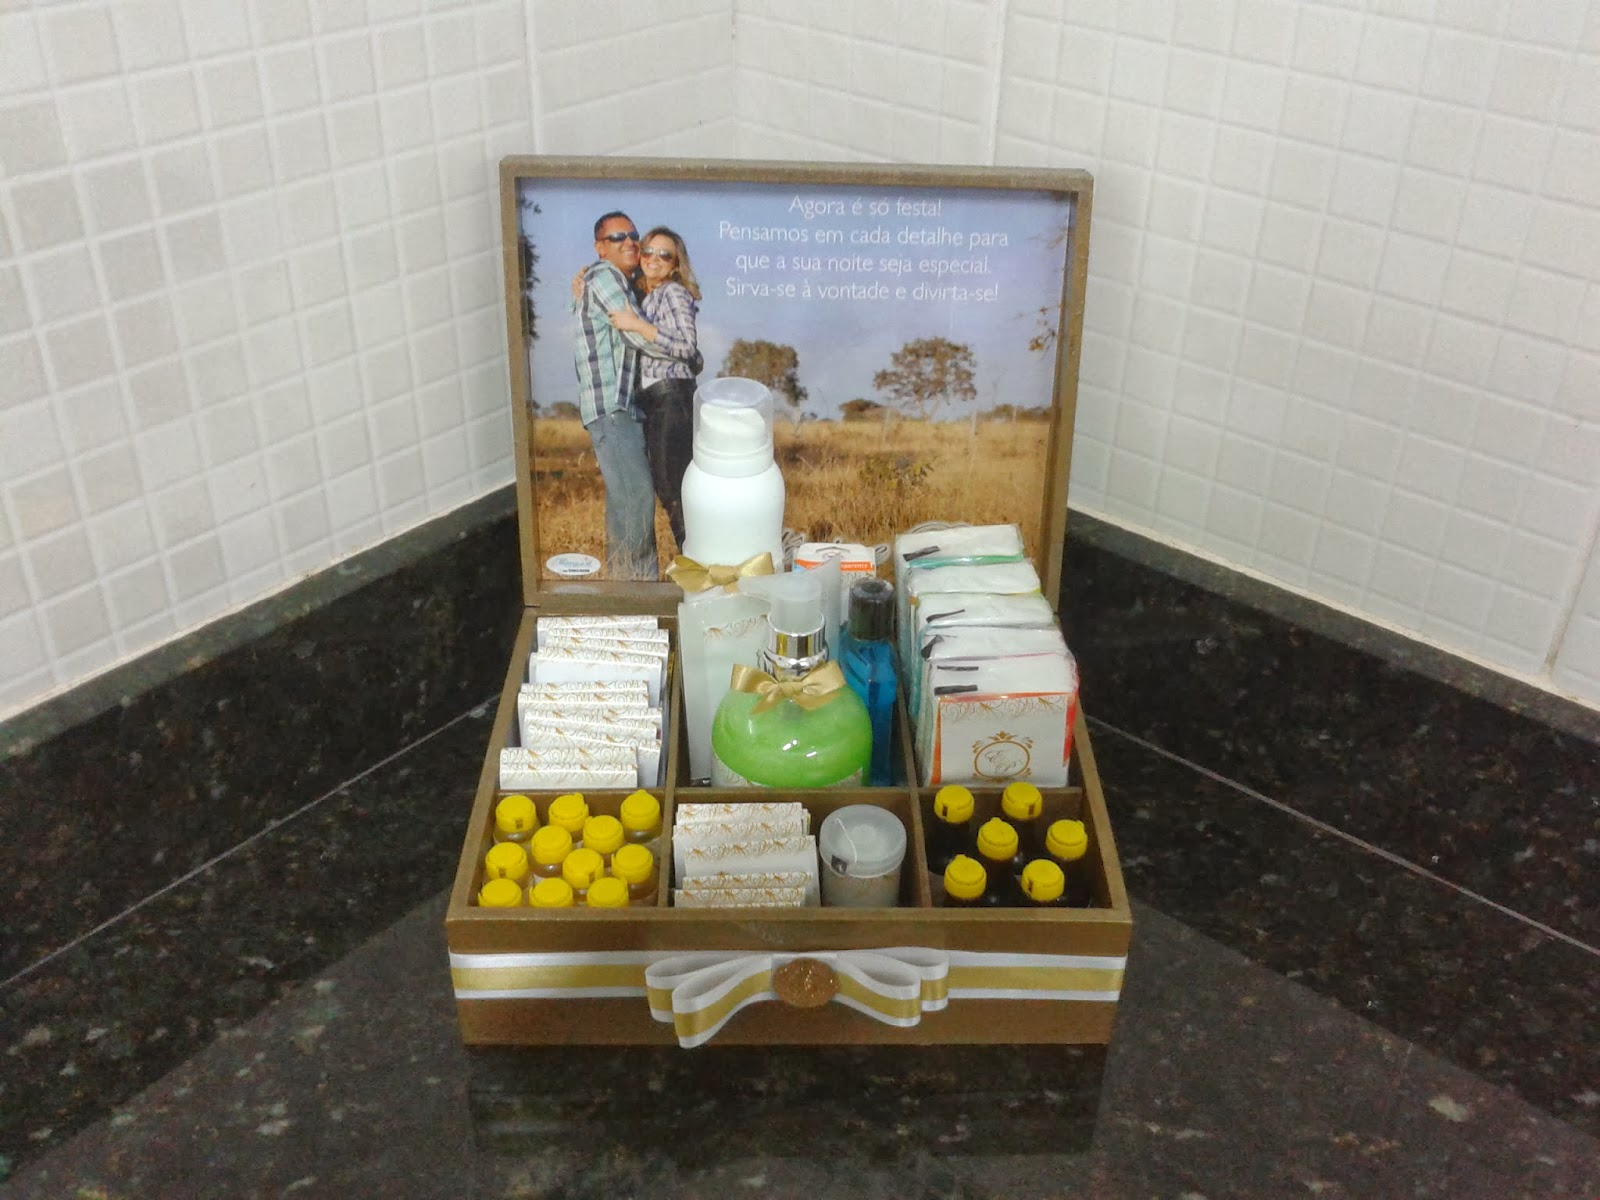 Casamento Kit Banheiro personalizado para os convidados do casal  #614928 1600 1200